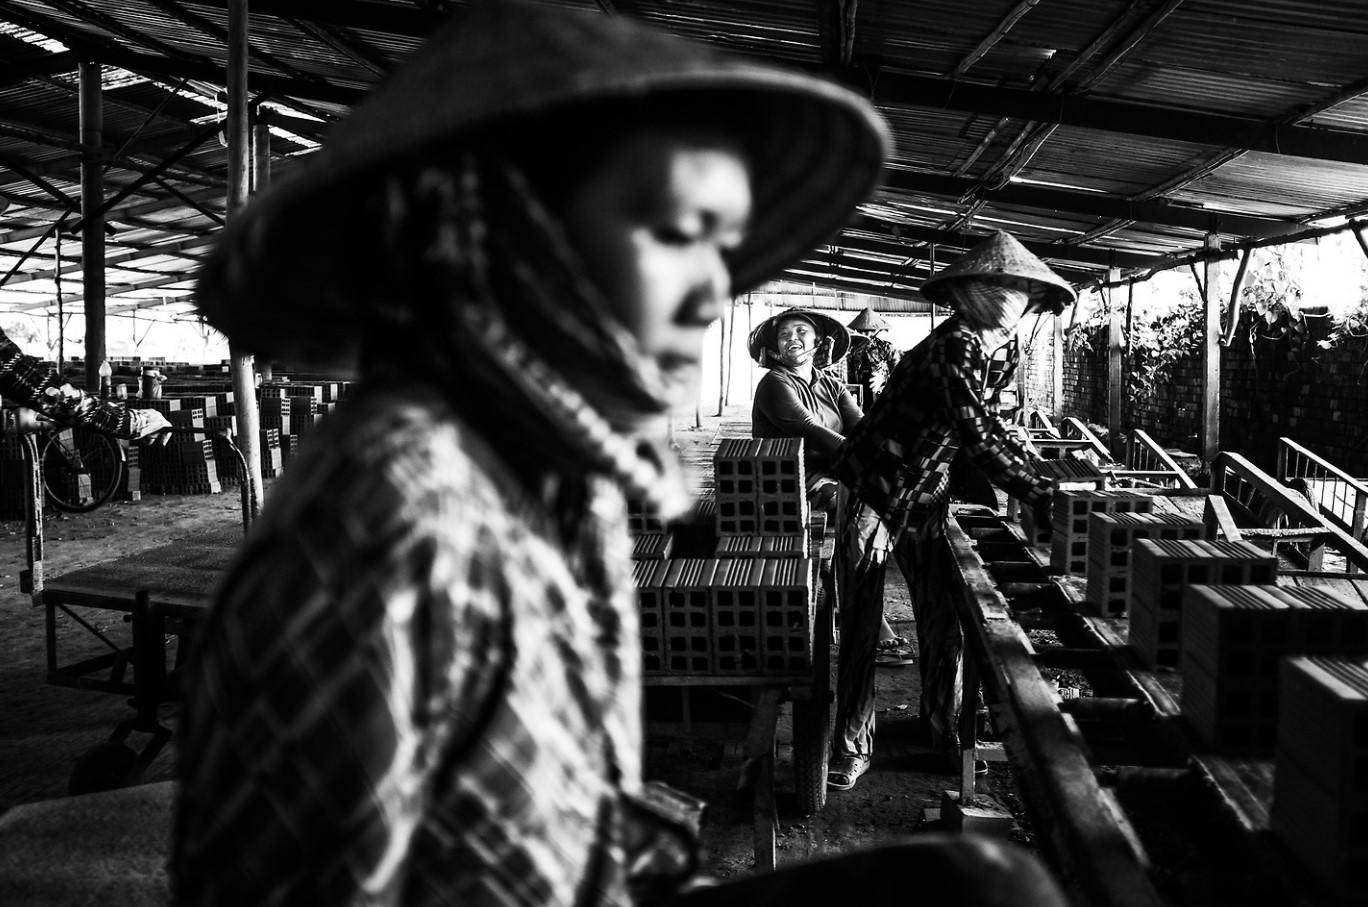 Quinn Ryan Mattingly - Pics of Asia / Saigon Photo Tours - Central Vietnam